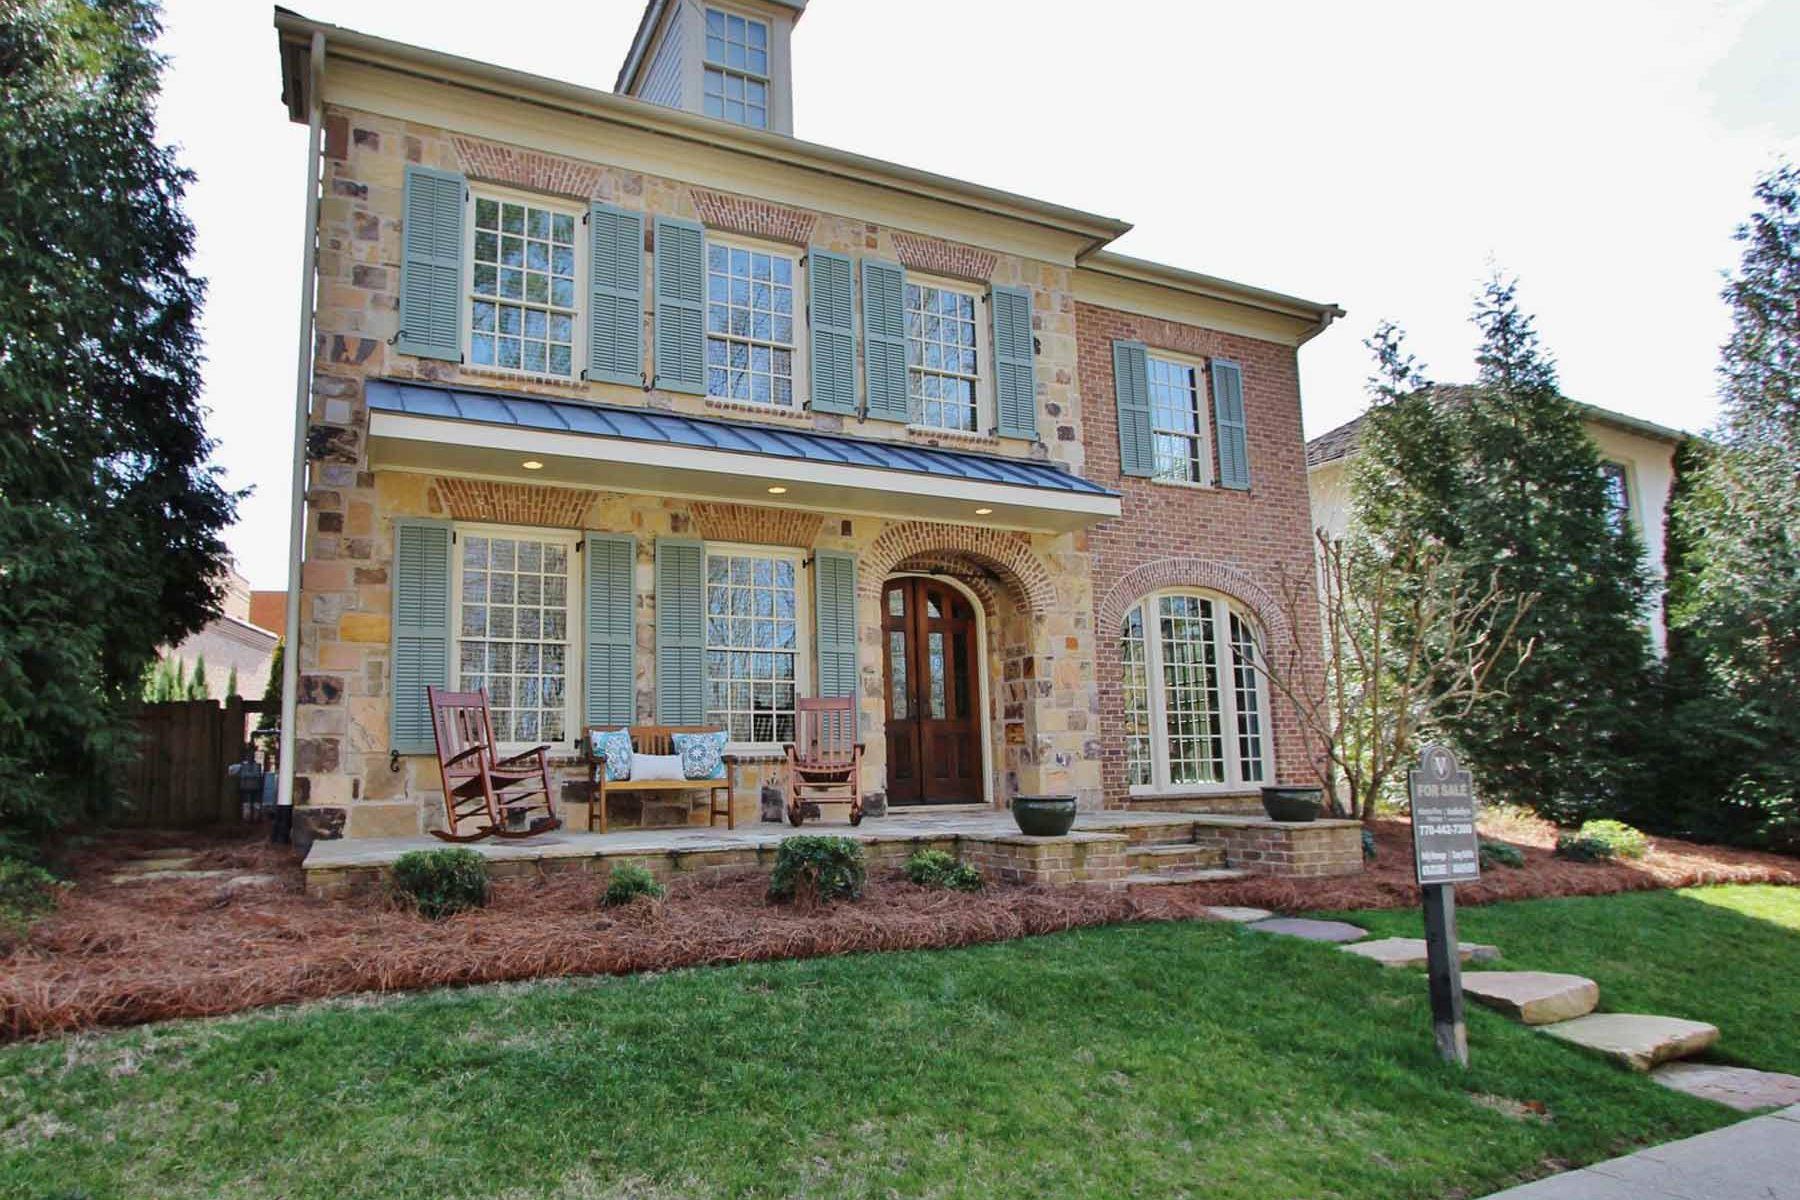 Casa para uma família para Venda às Beautiful Home in Sought After Vickery 6750 Lullwater Rd Cumming, Geórgia, 30040 Estados Unidos